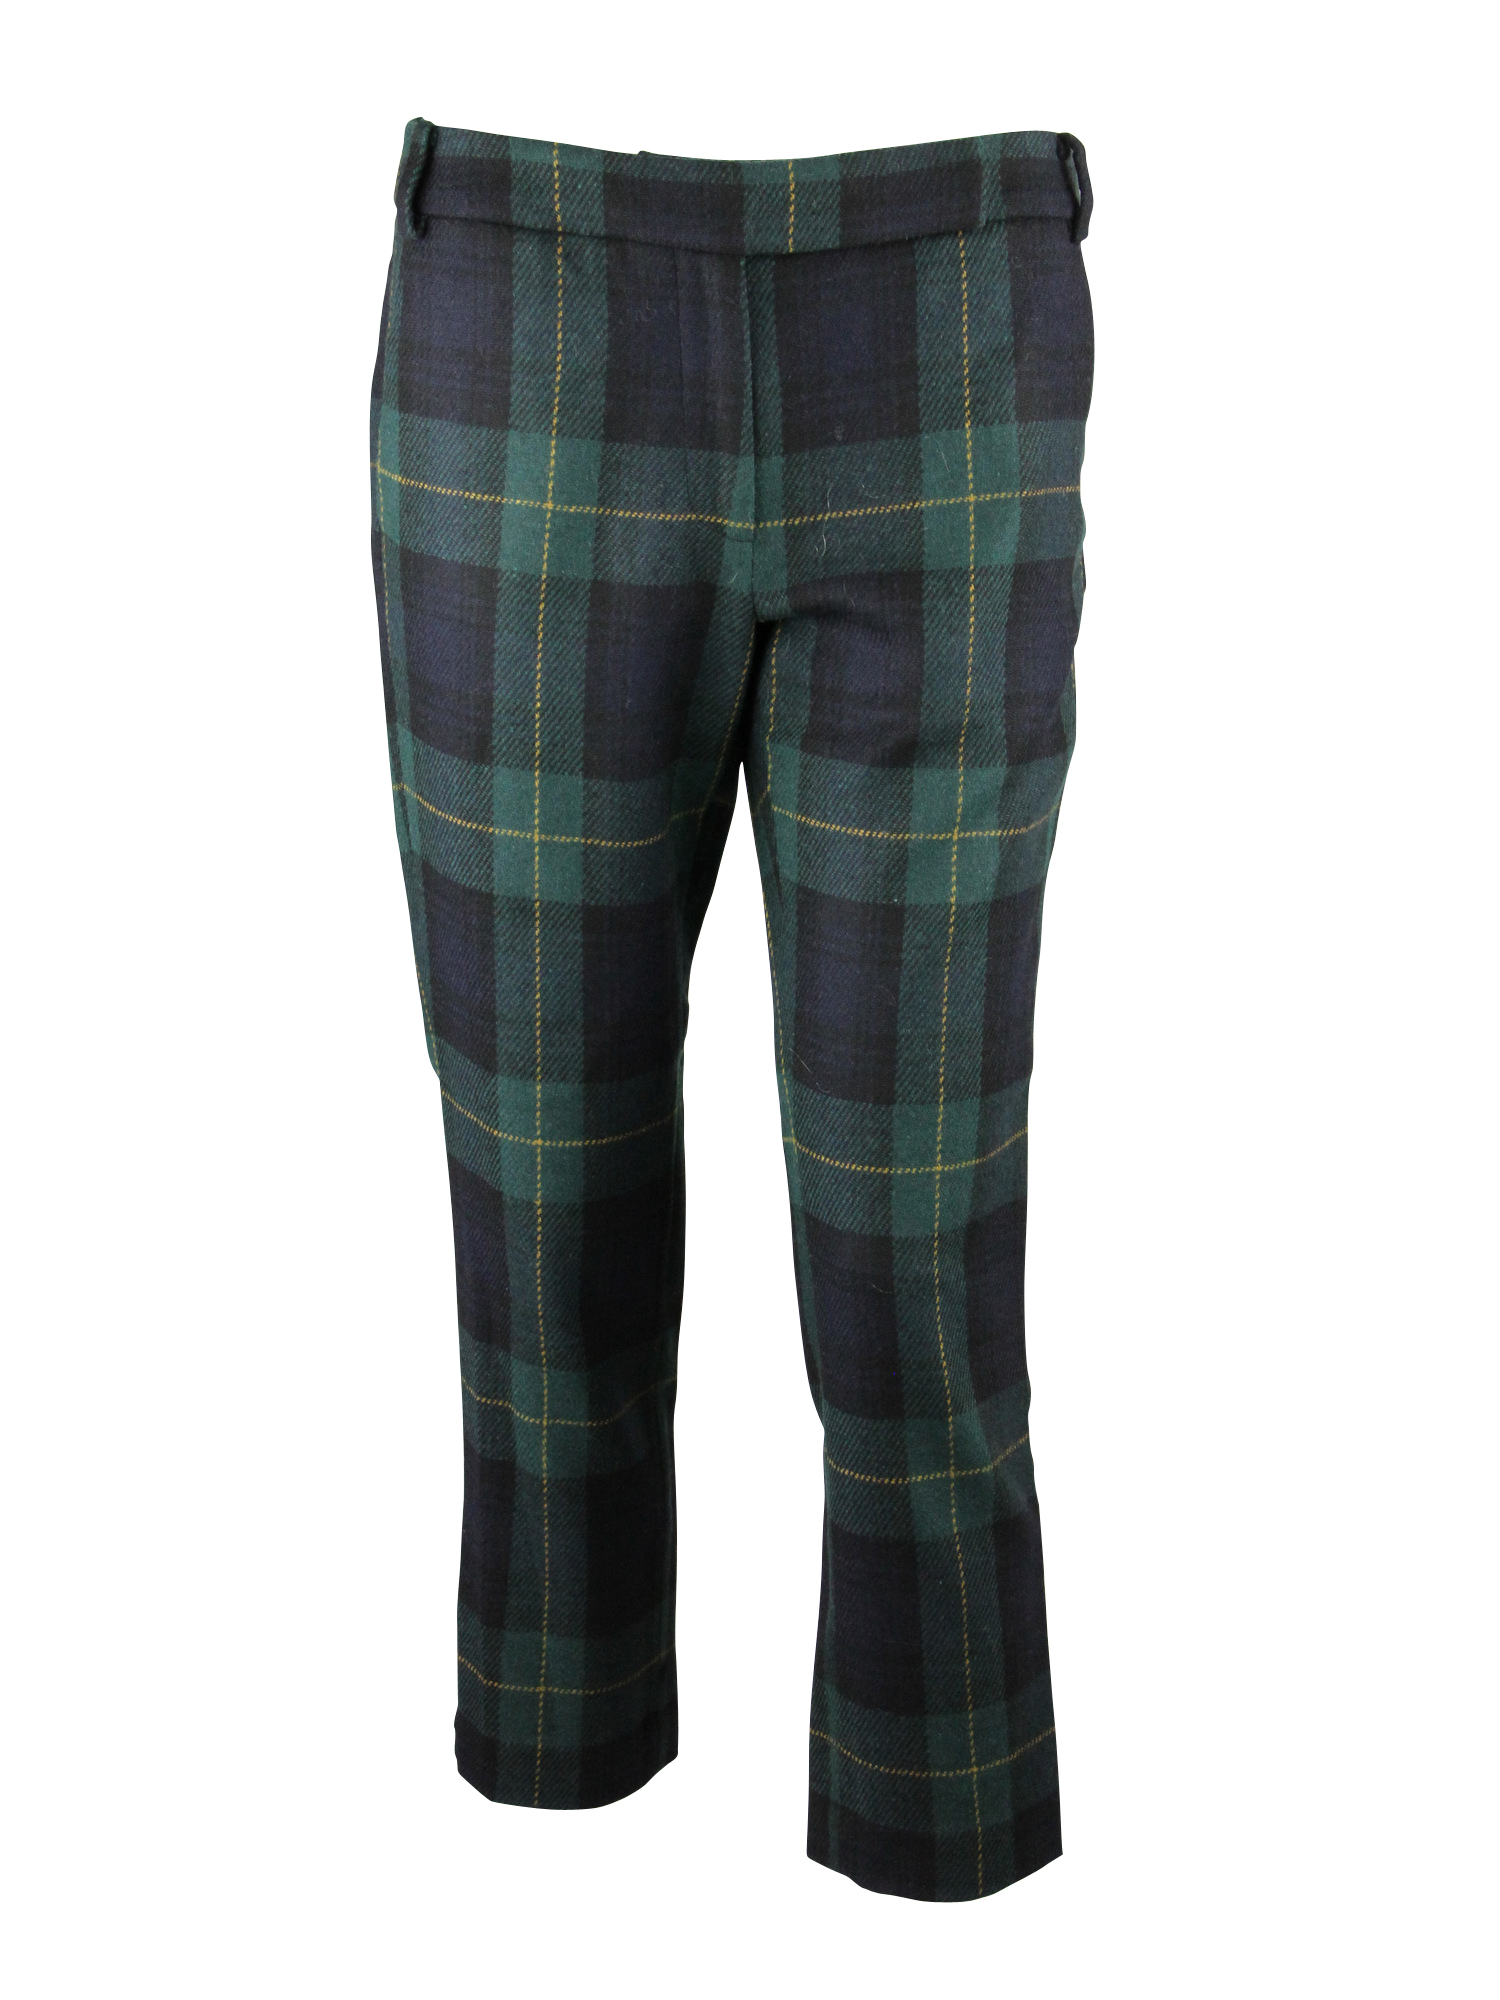 Fantastic Causal Ladies Tartan Pants Plaid Check Pockets Womens Pencil Trousers